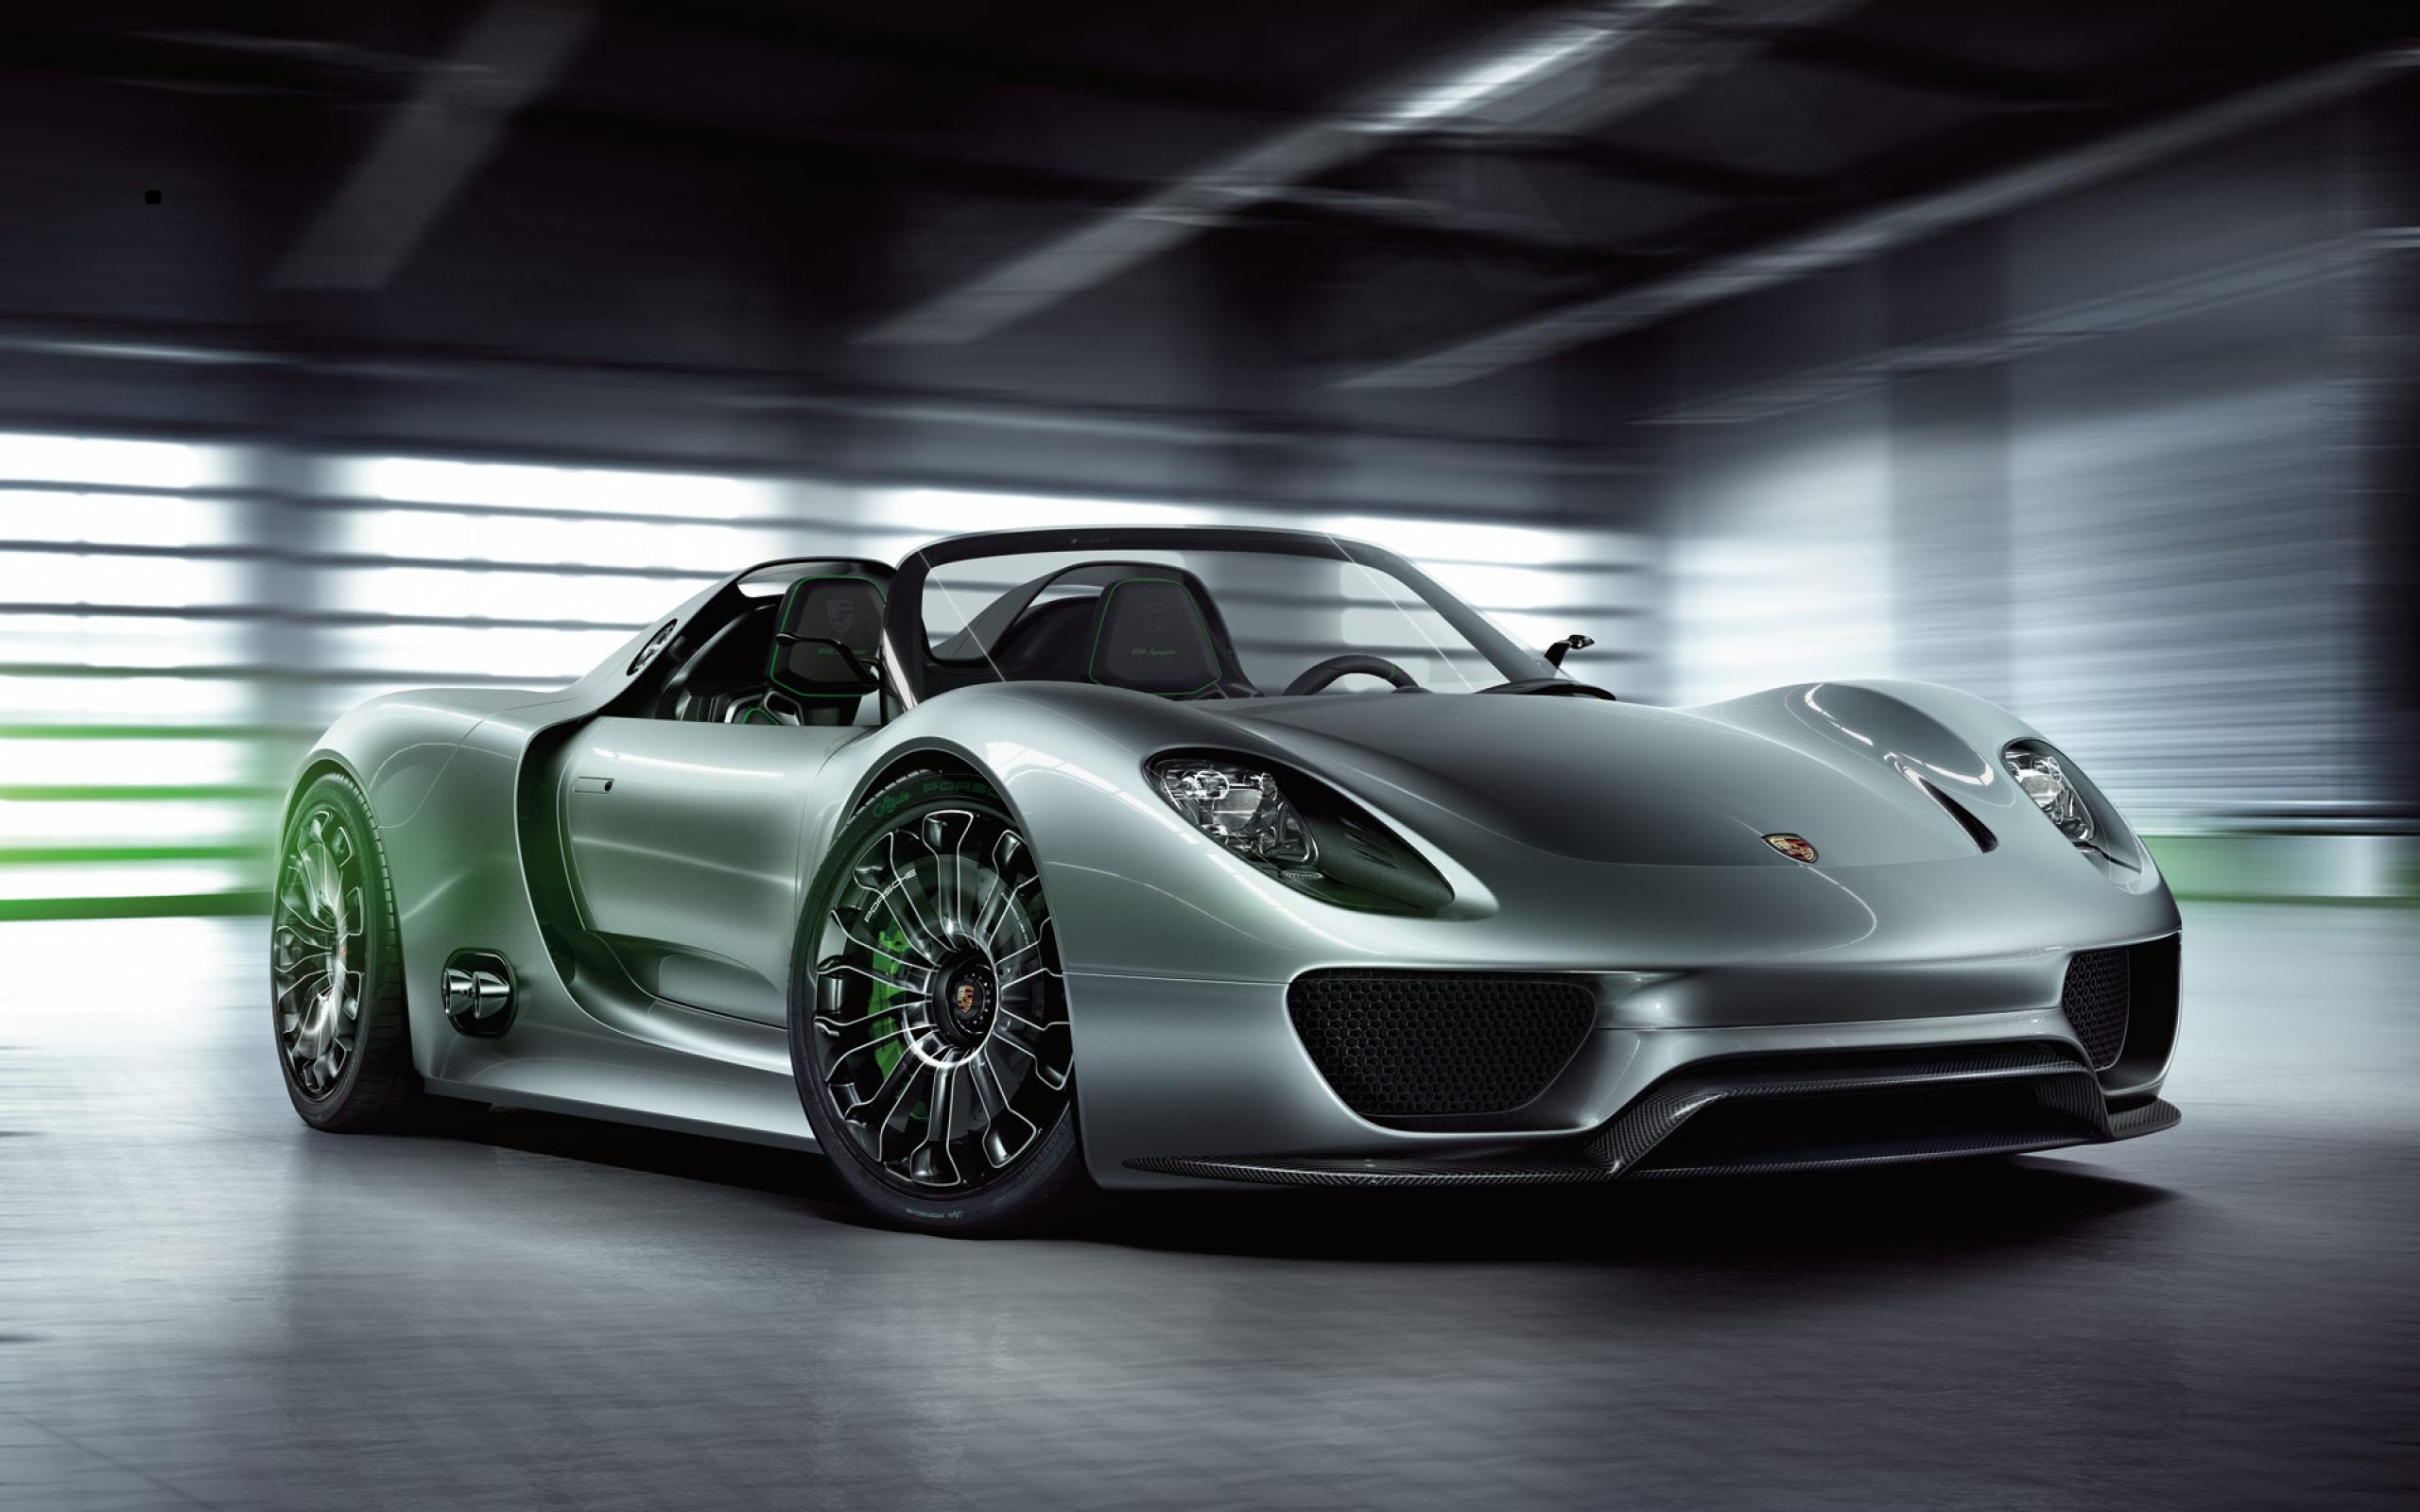 Porsche car PNG image - Porsche HD PNG